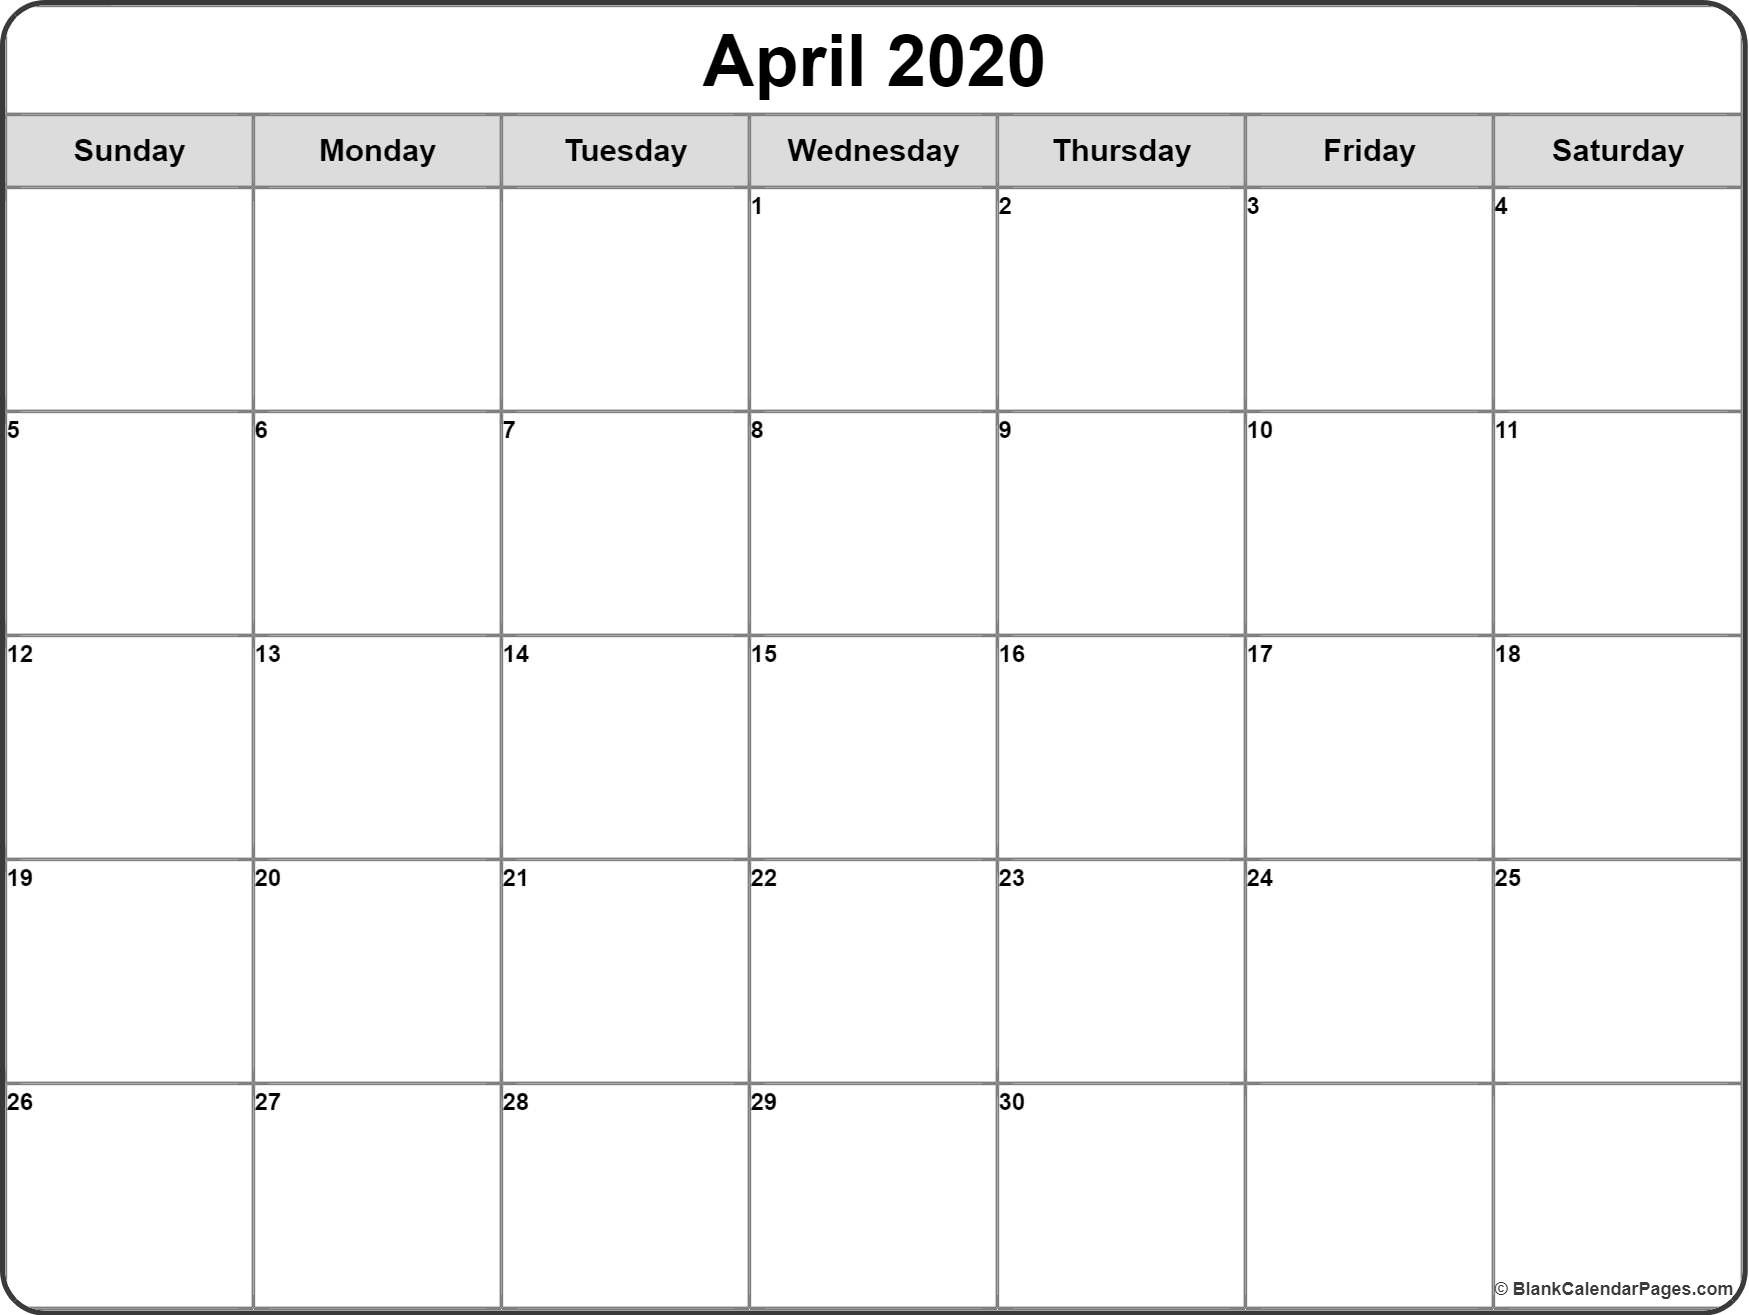 April 2020 Calendar   Free Printable Monthly Calendars-Fill In Calendar April 2020 Template